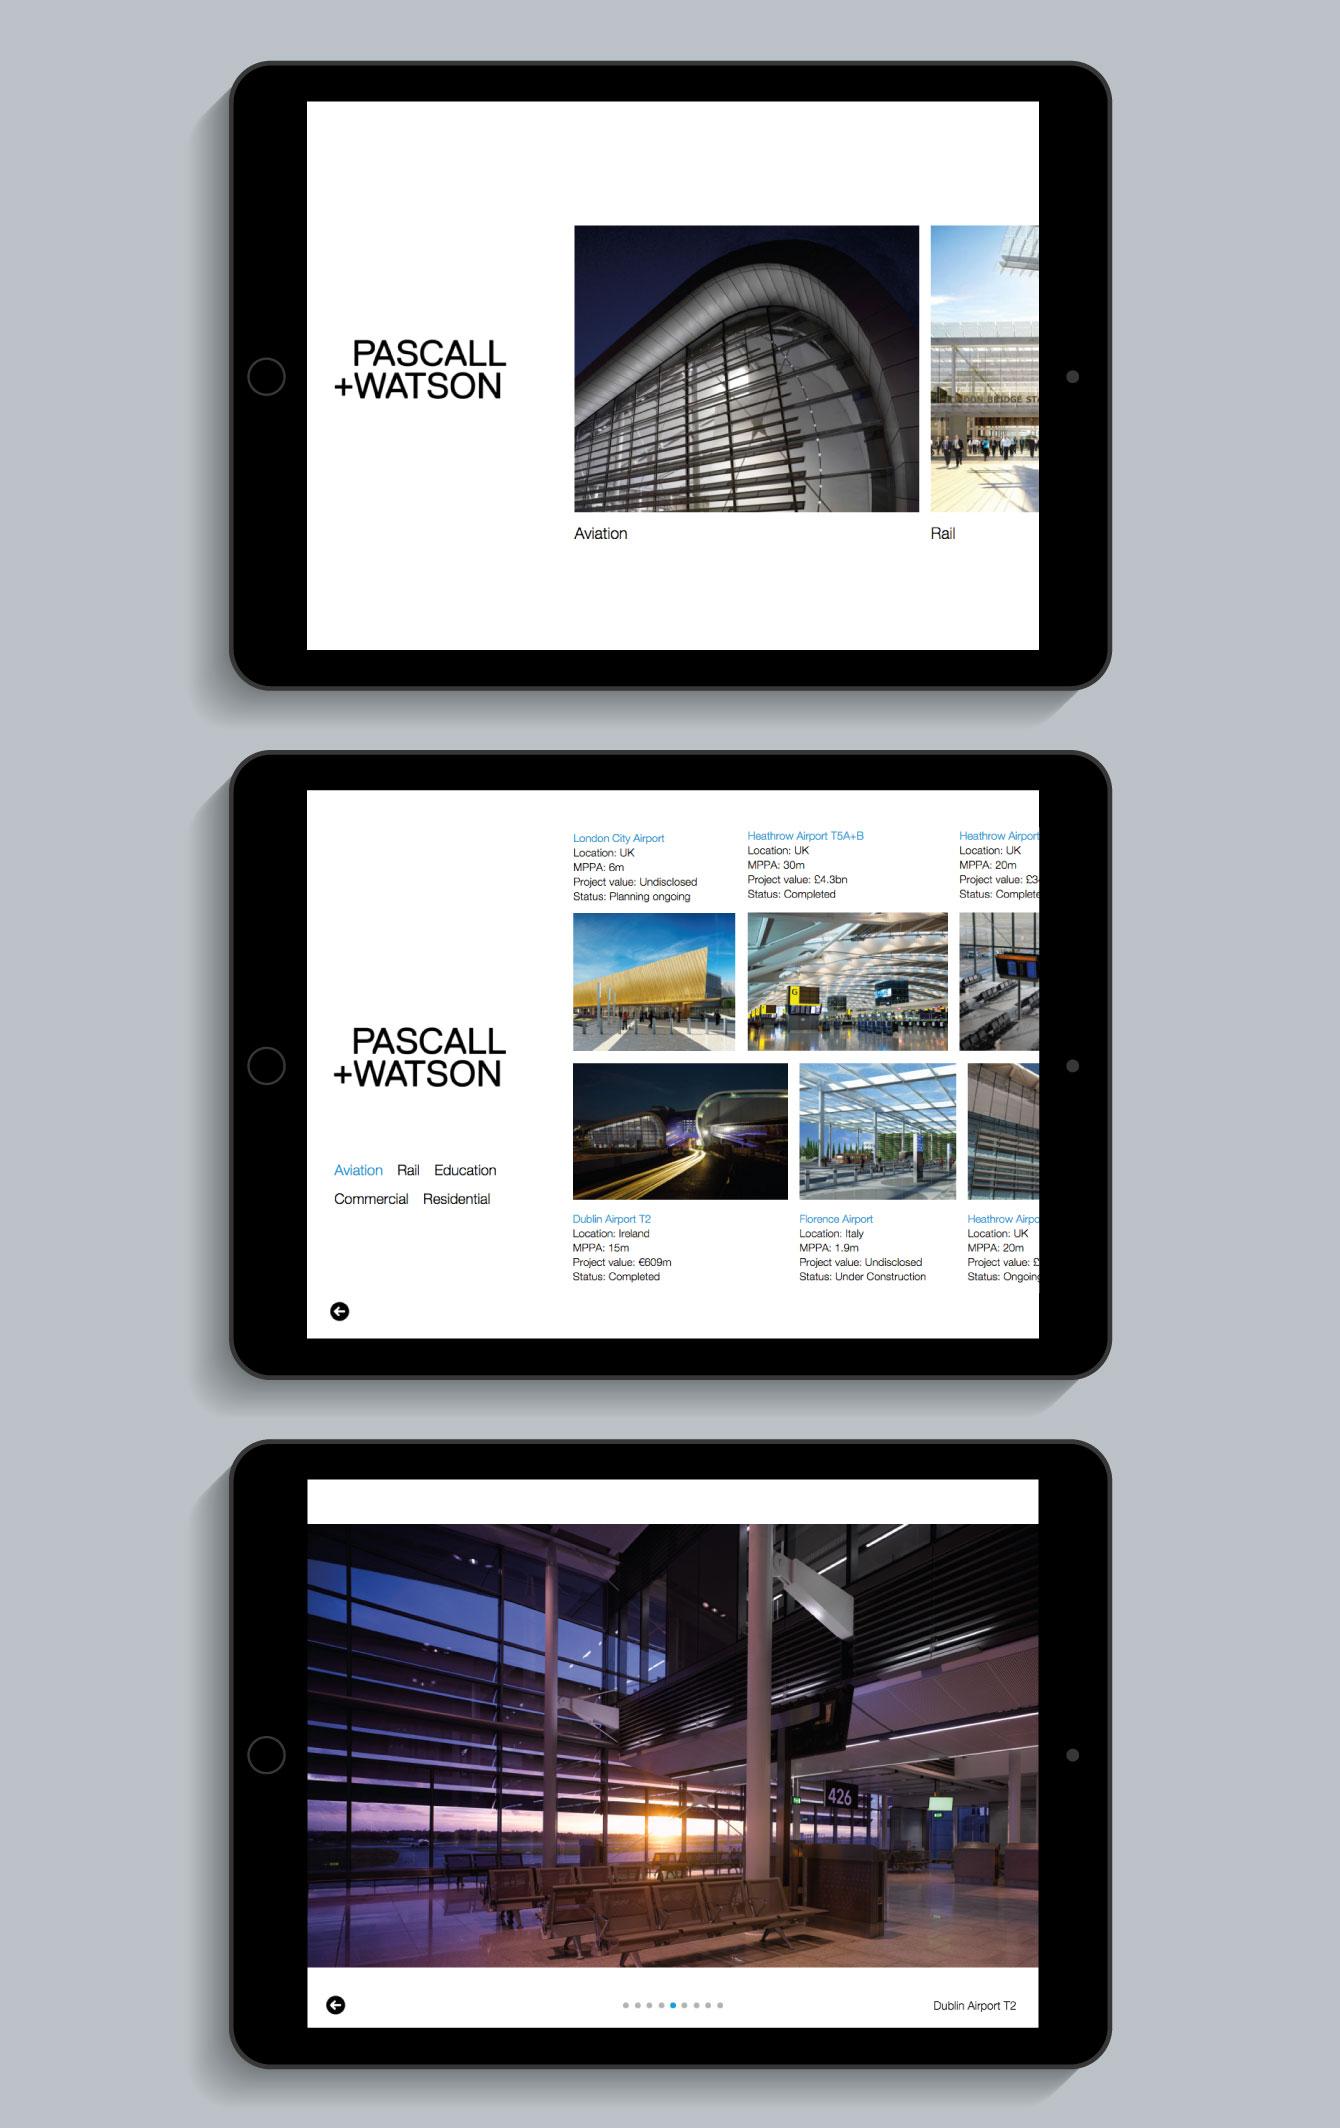 The Pascall+Watson iPad app displayed on an iPad - desktop